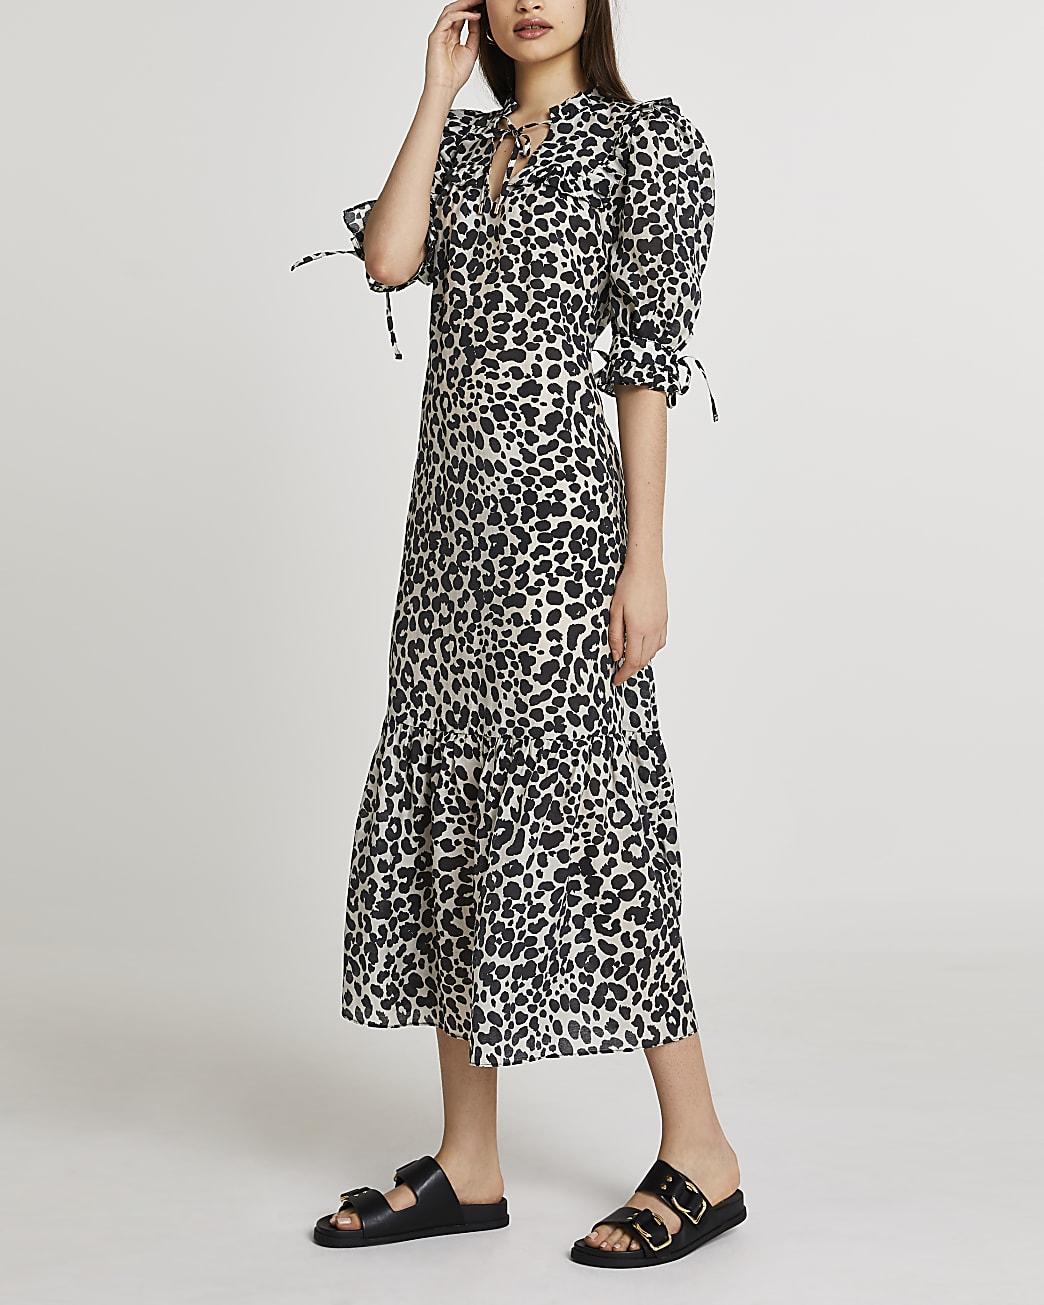 Black animal print smock dress